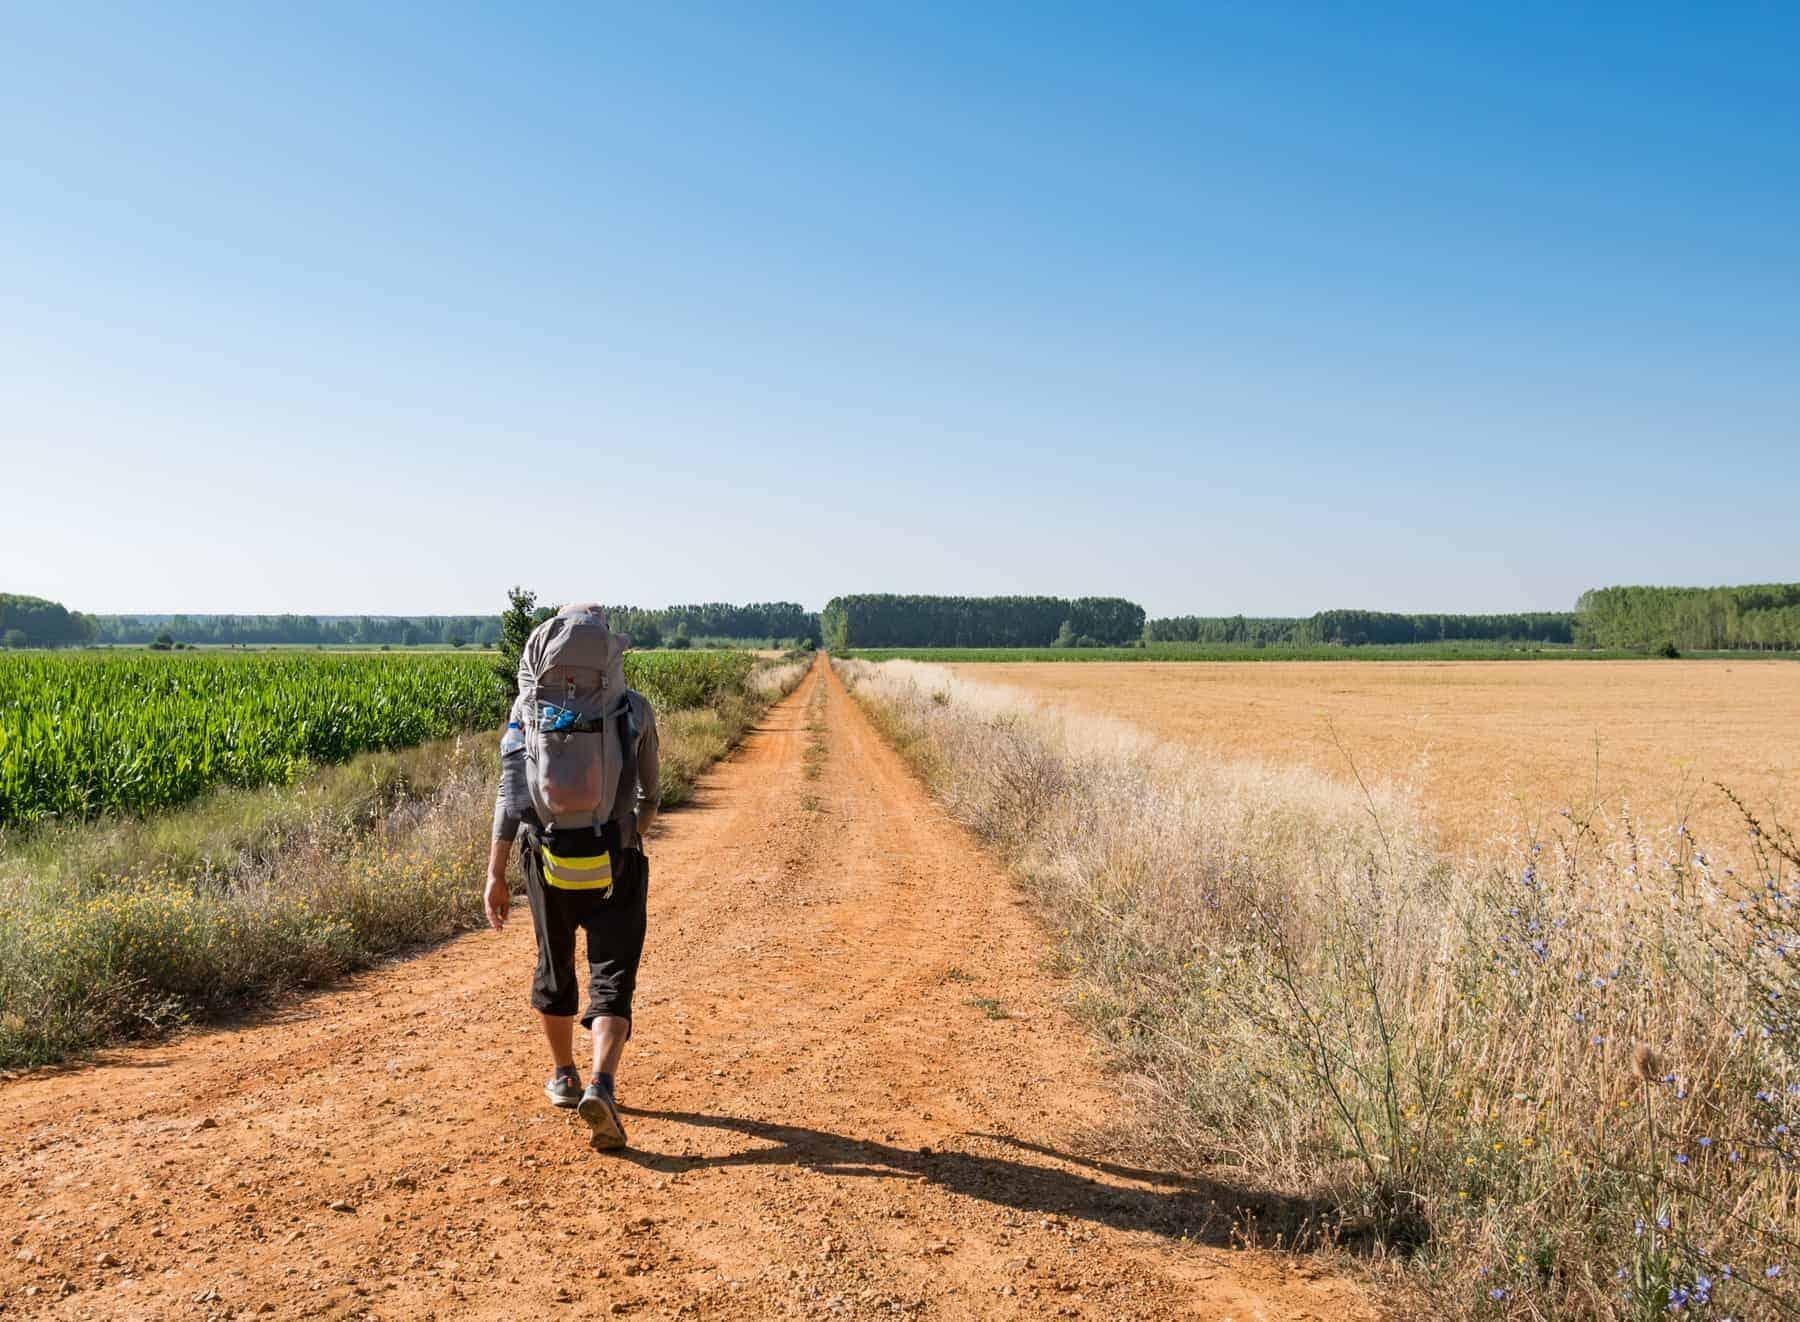 Lonely Pilgrim with backpack walking the Camino de Santiago in Spain